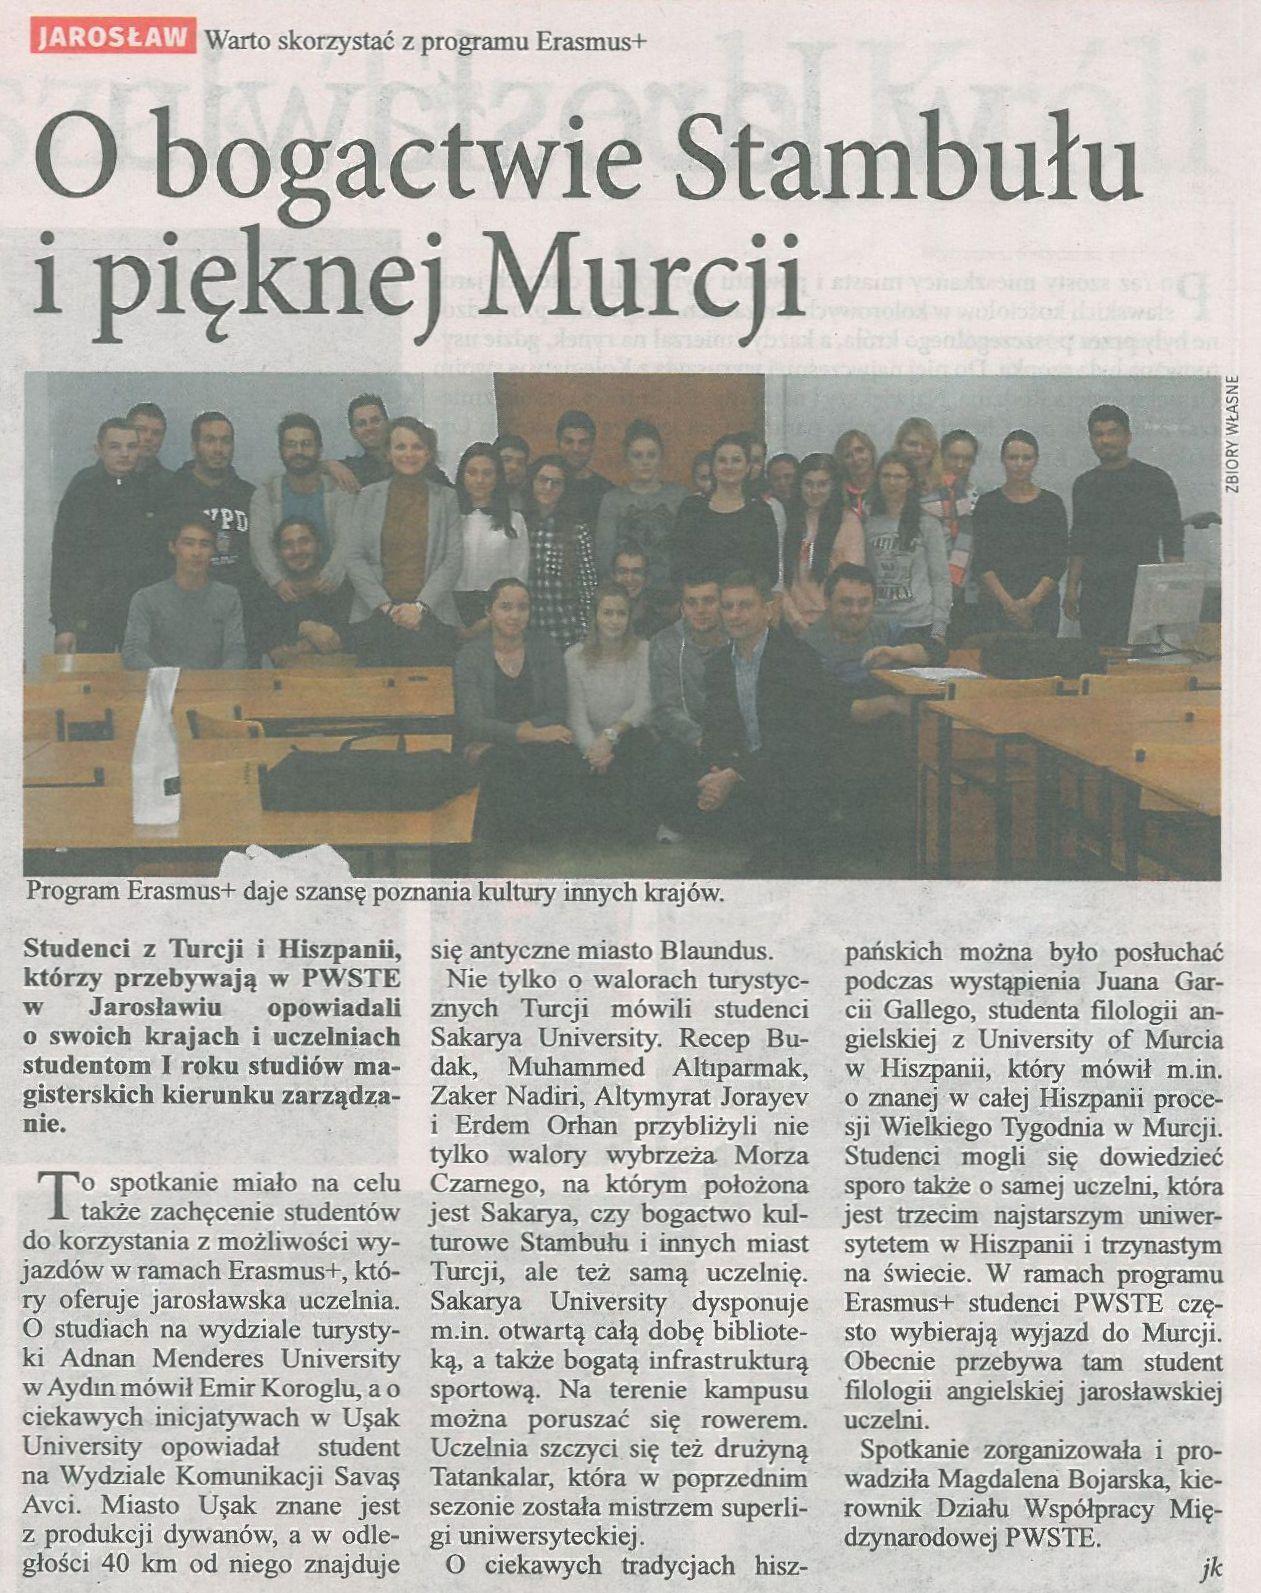 Ekspres Jaroslawski 20170110 nr 2 str.11